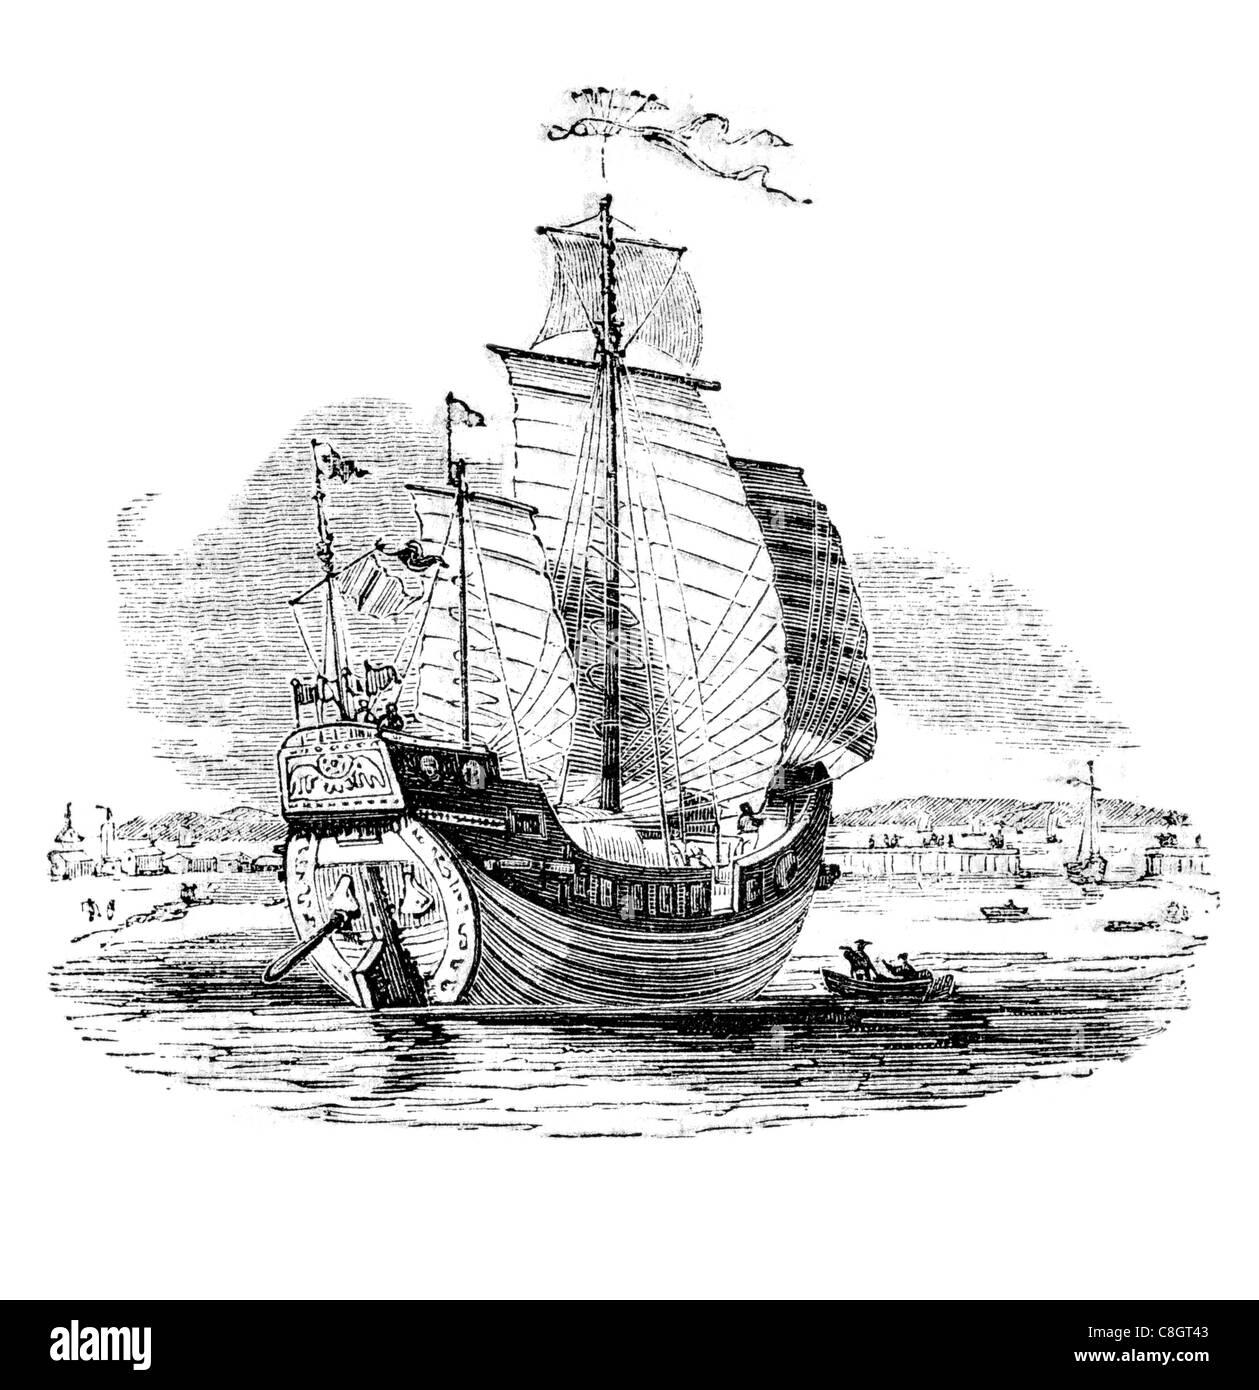 trading Chinese trading junk ancient Chinese sailing vessel Junks Han Dynasty Asia ocean voyage Hong Kong junk-rigged - Stock Image